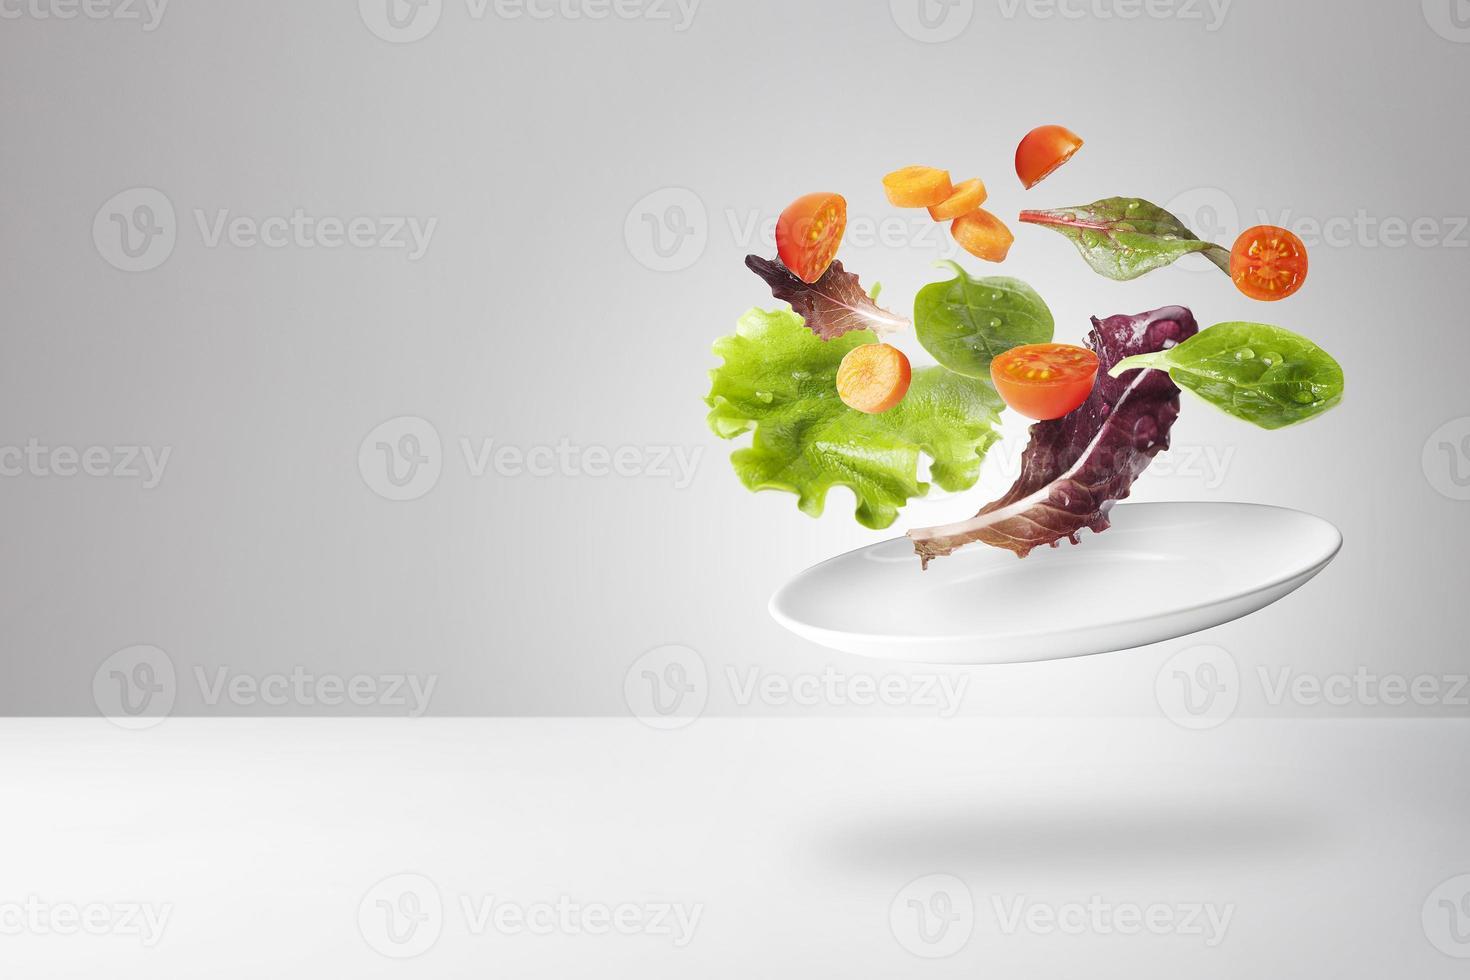 insalata leggera con verdure galleggianti foto